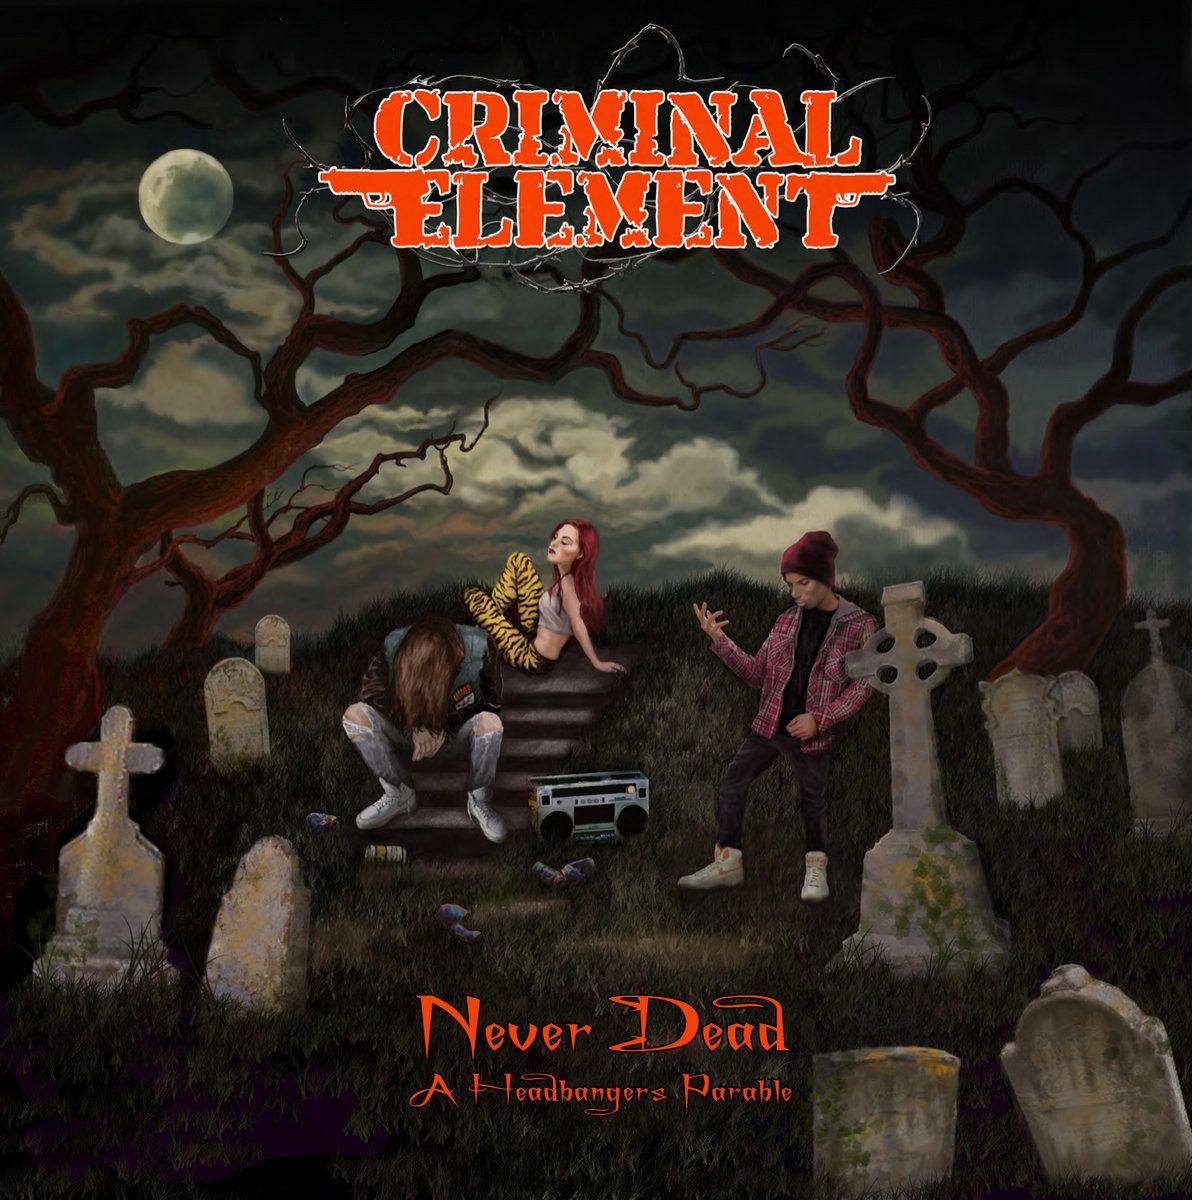 Criminal Element - Never Dead (A Headbanger's Parable)